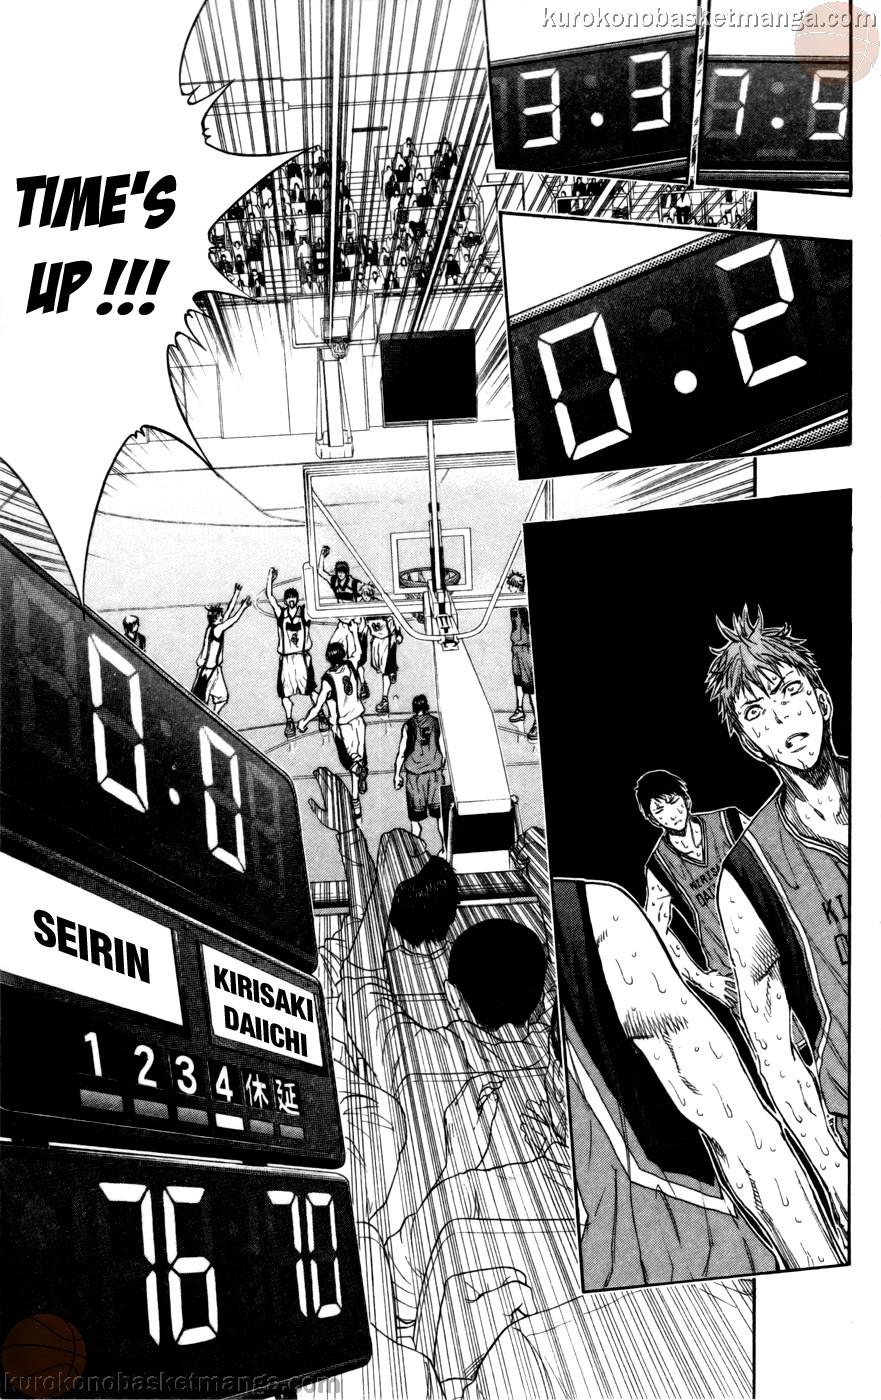 Kuroko no Basket Manga Chapter 107 - Image 18